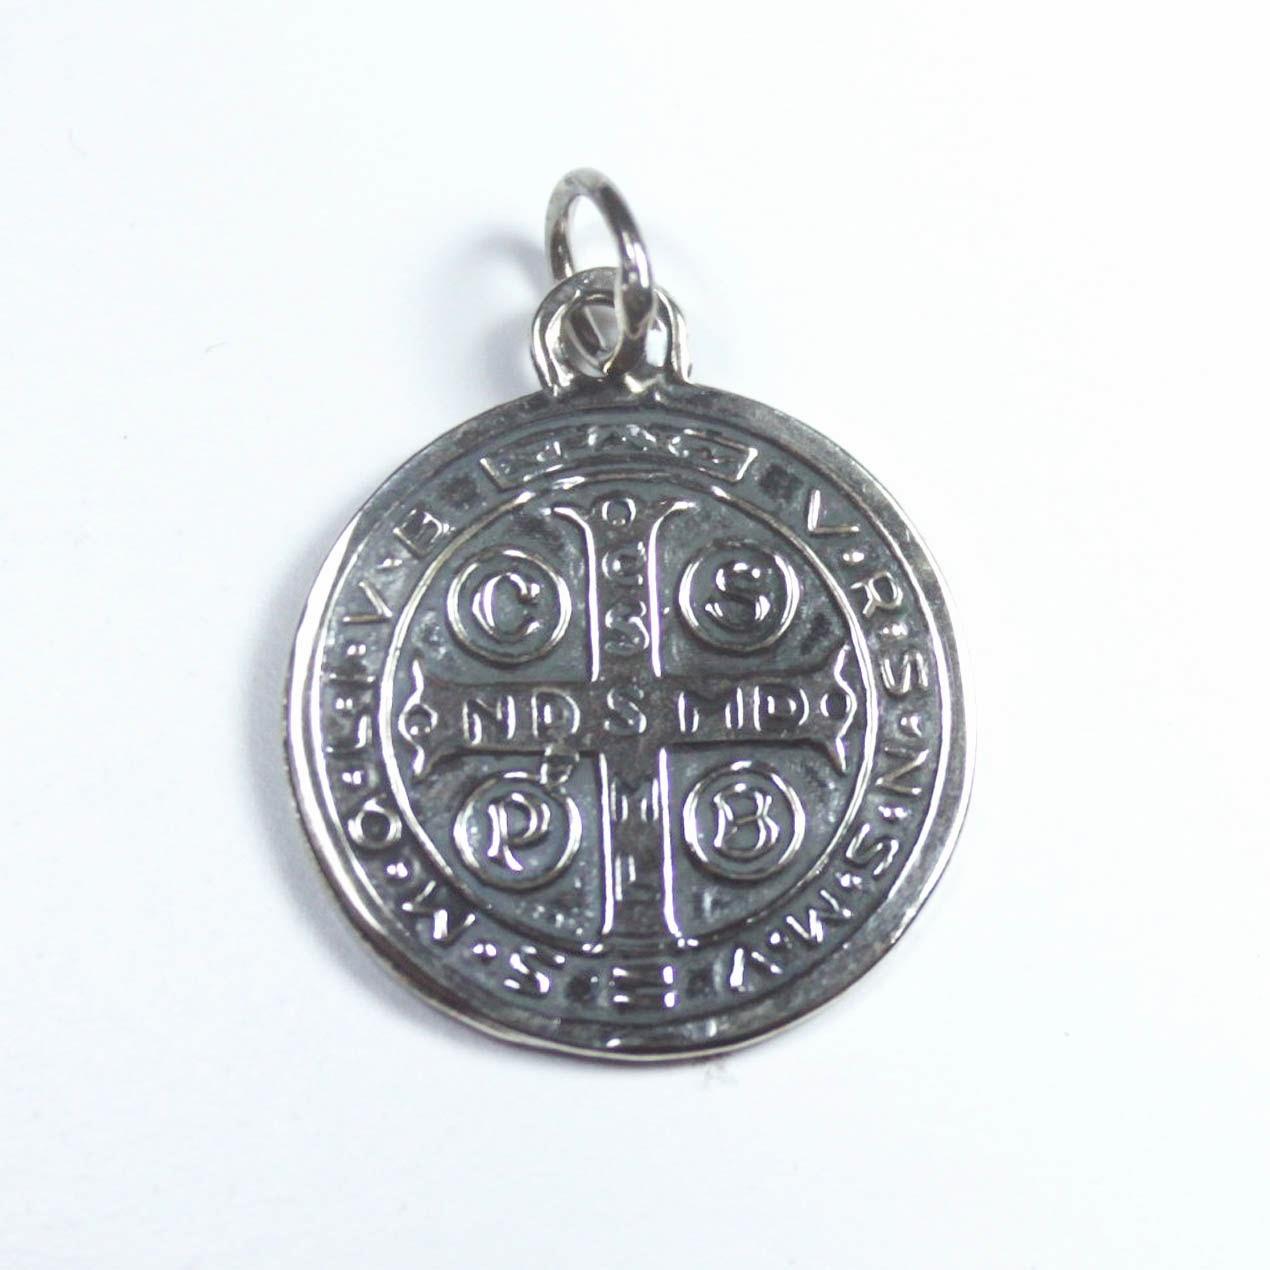 b9c431330bb Blog de cotilleo en español  Comprar Medalla de San Benito plata